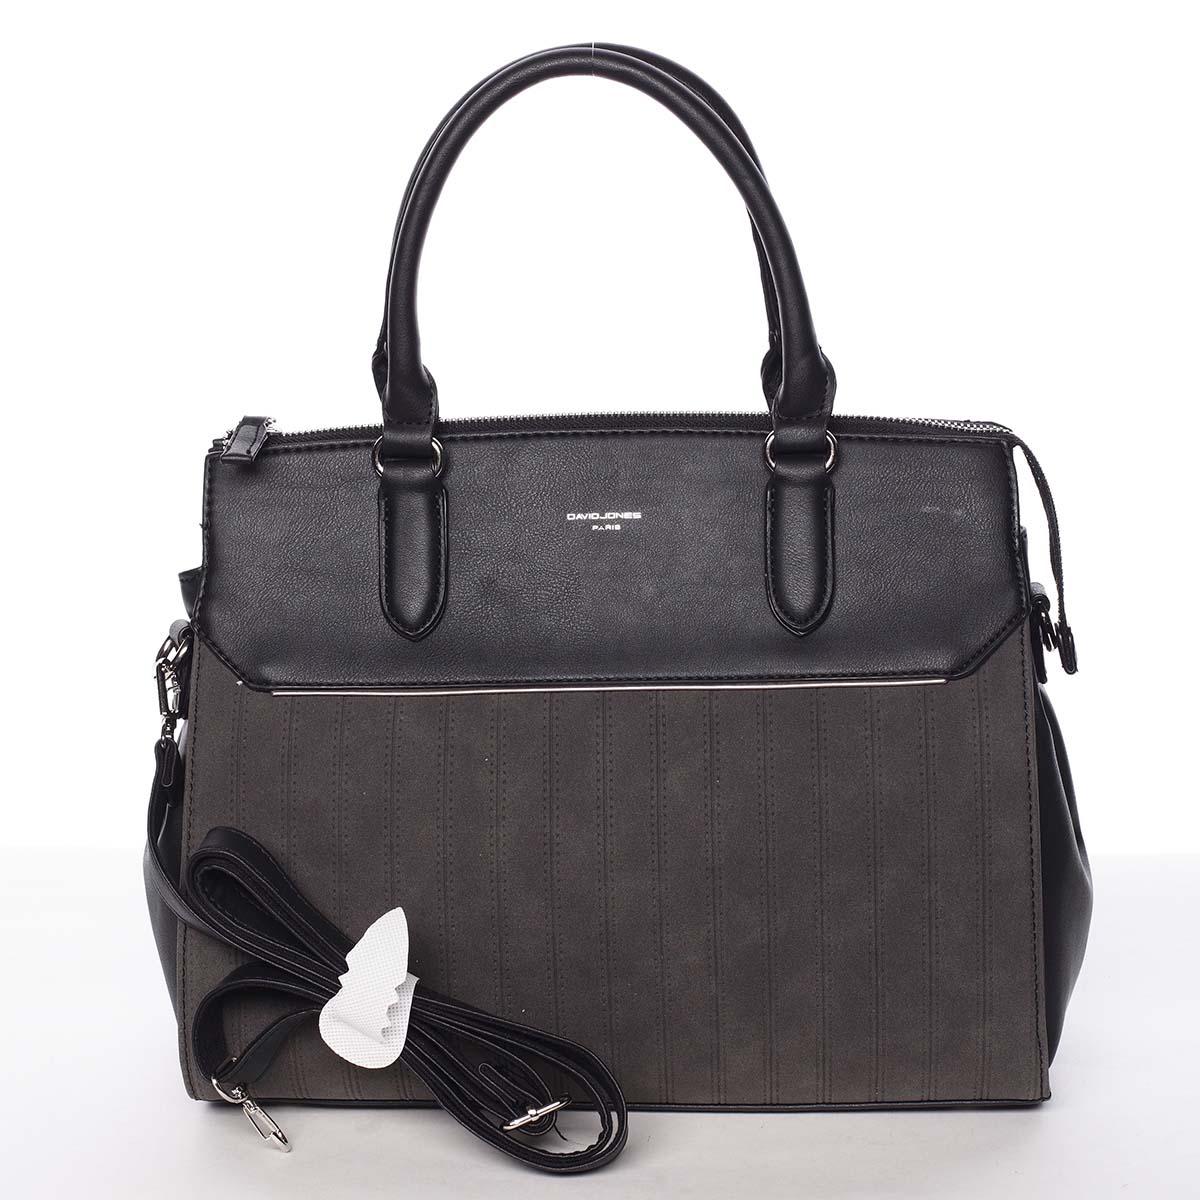 Luxusná nadčasová dámska čierna kabelka - David Jones Allison čierna